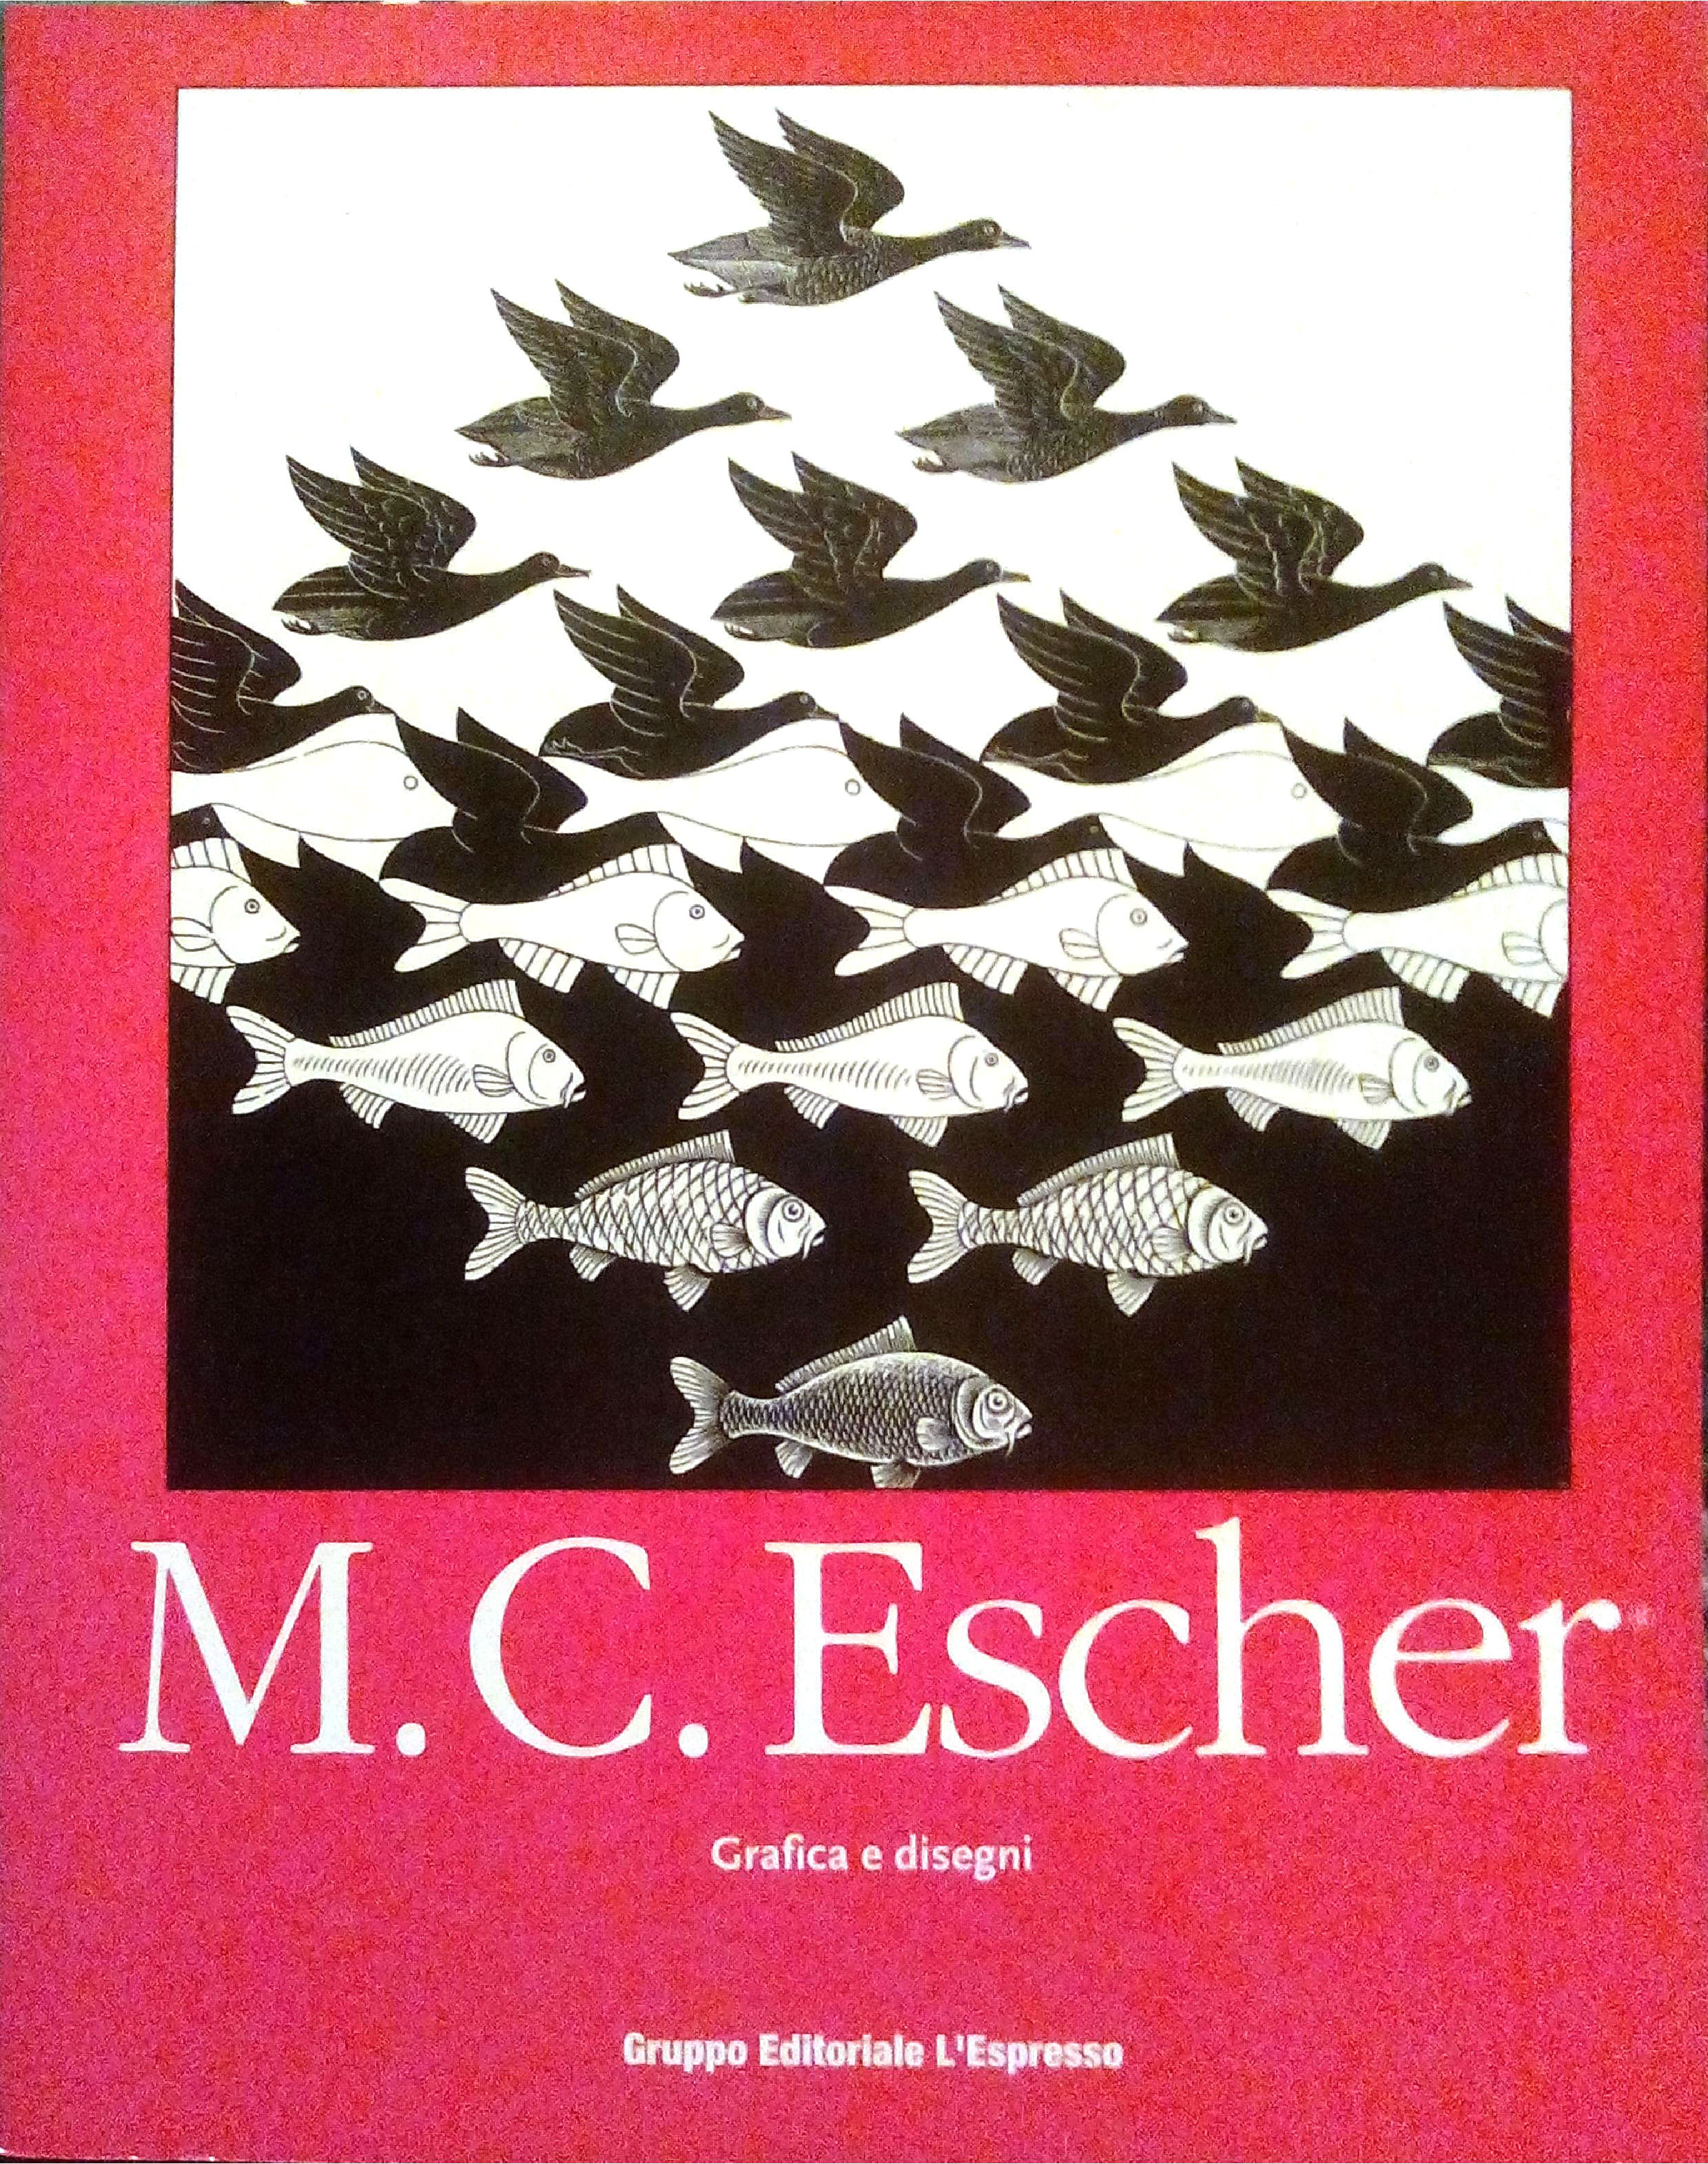 M.C. Escher Grafica e disegni  by  M.C. Escher